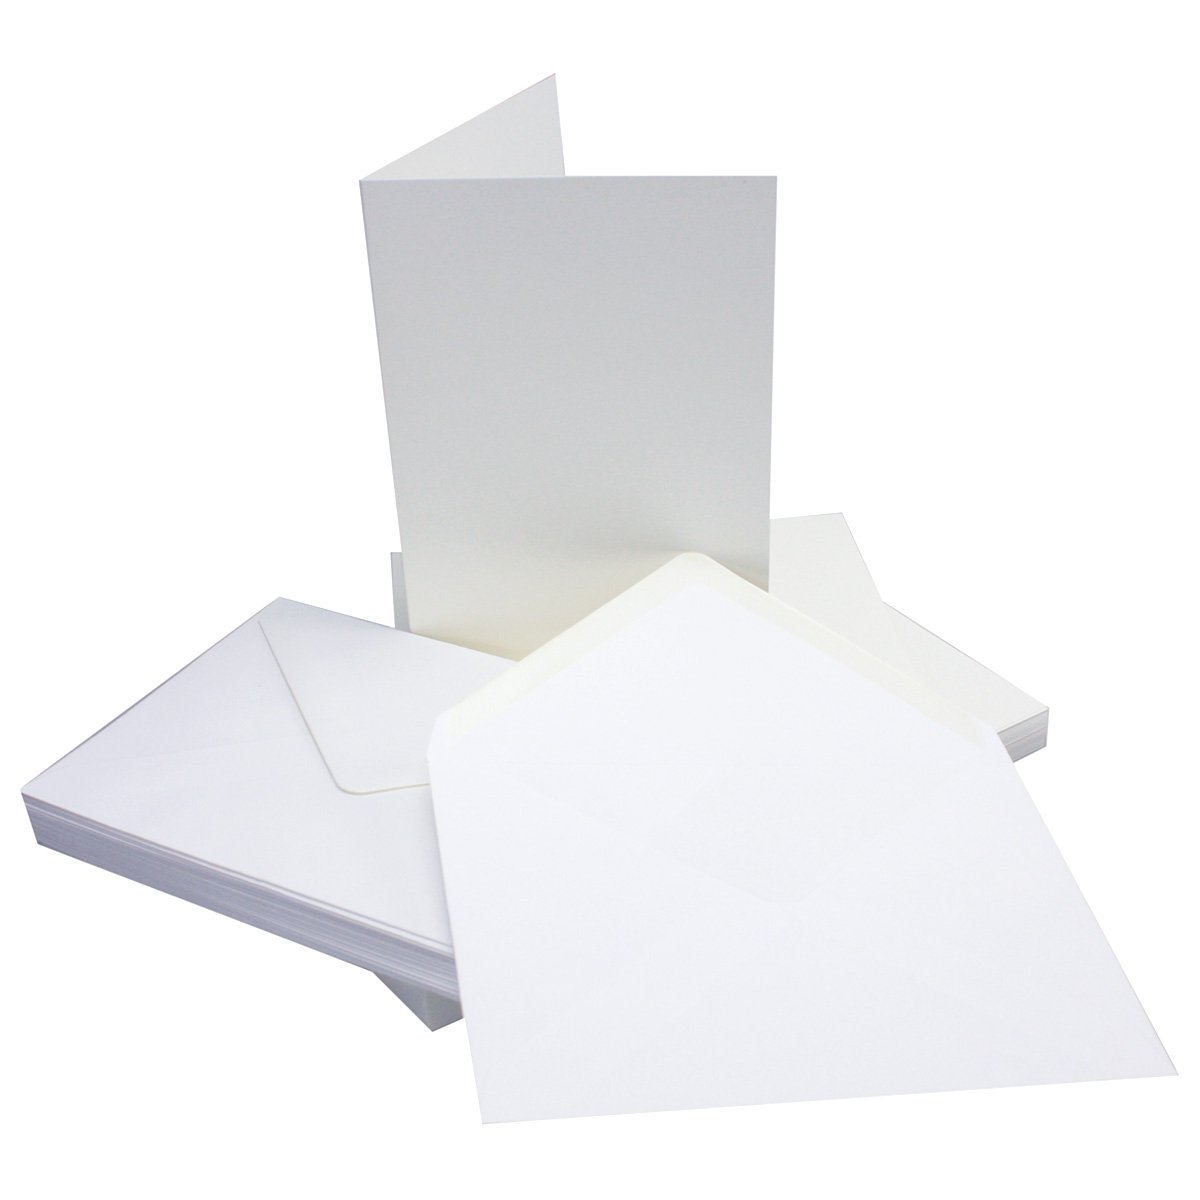 75 Sets Sets Sets - Faltkarten Hellgrau - Din A5  Umschläge Din C5 - Premium Qualität - Sehr formstabil - Qualitätsmarke  NEUSER FarbenFroh B07BSF1KMS | Niedriger Preis  3b41b8